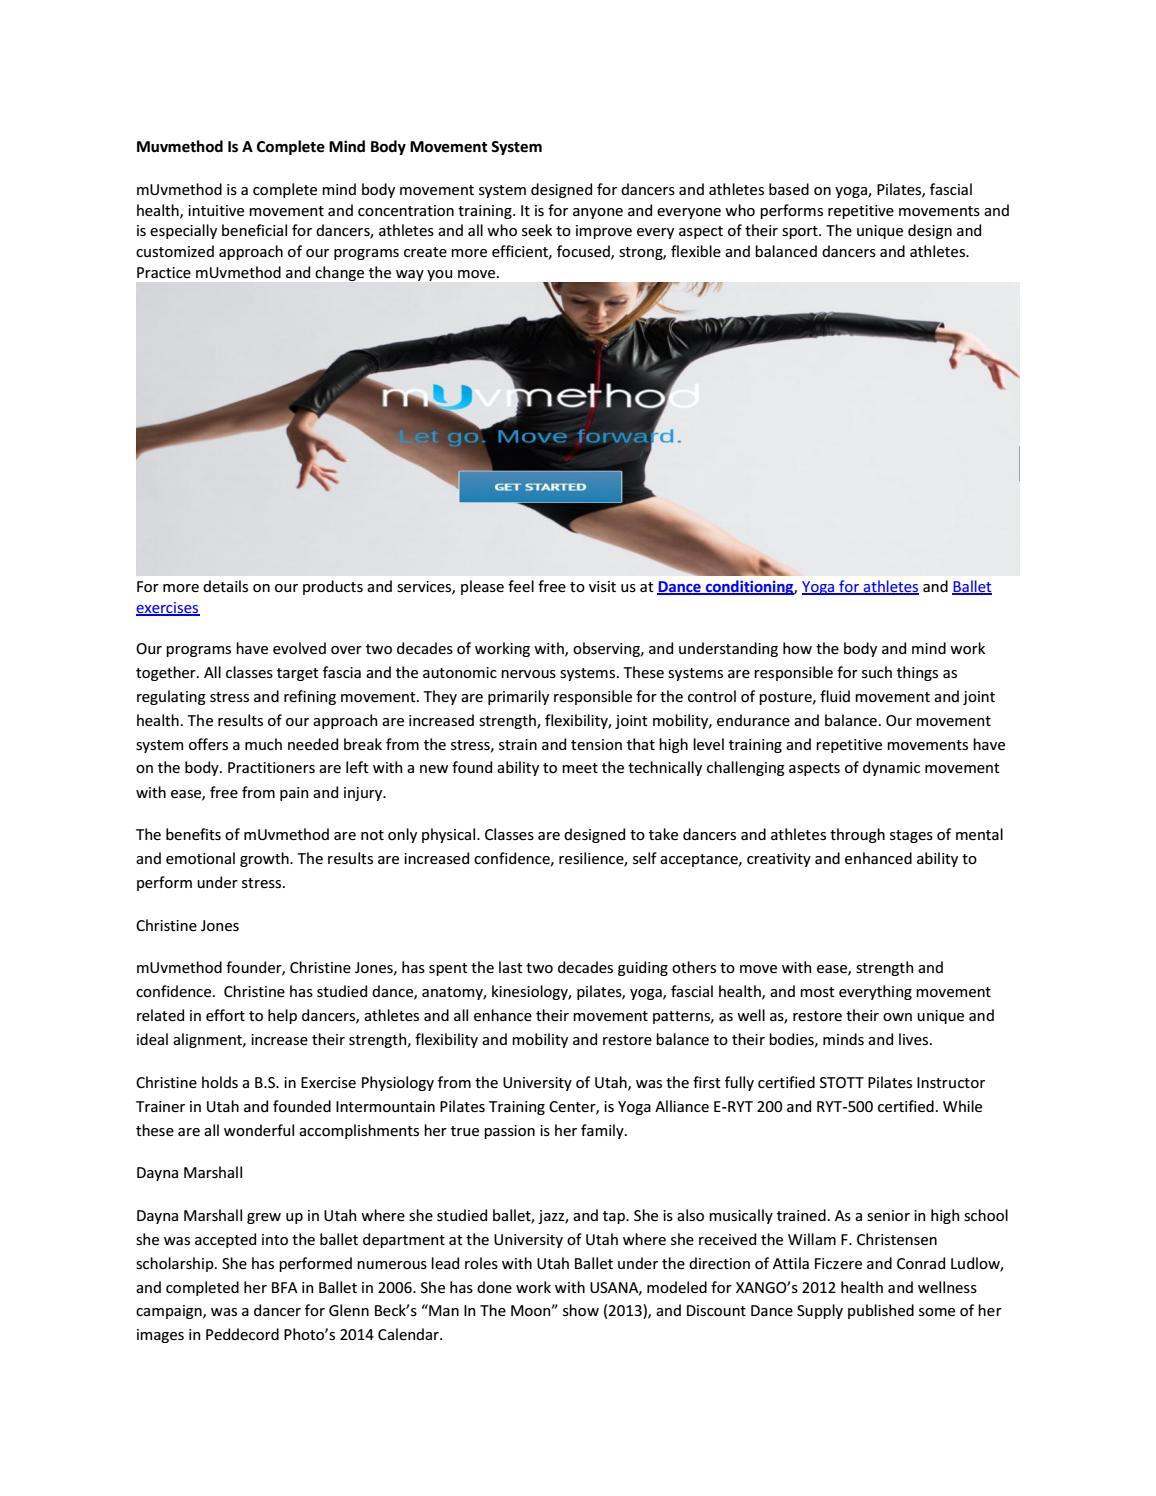 Benefits of mindfulness and meditation part 2 by mUvmethod